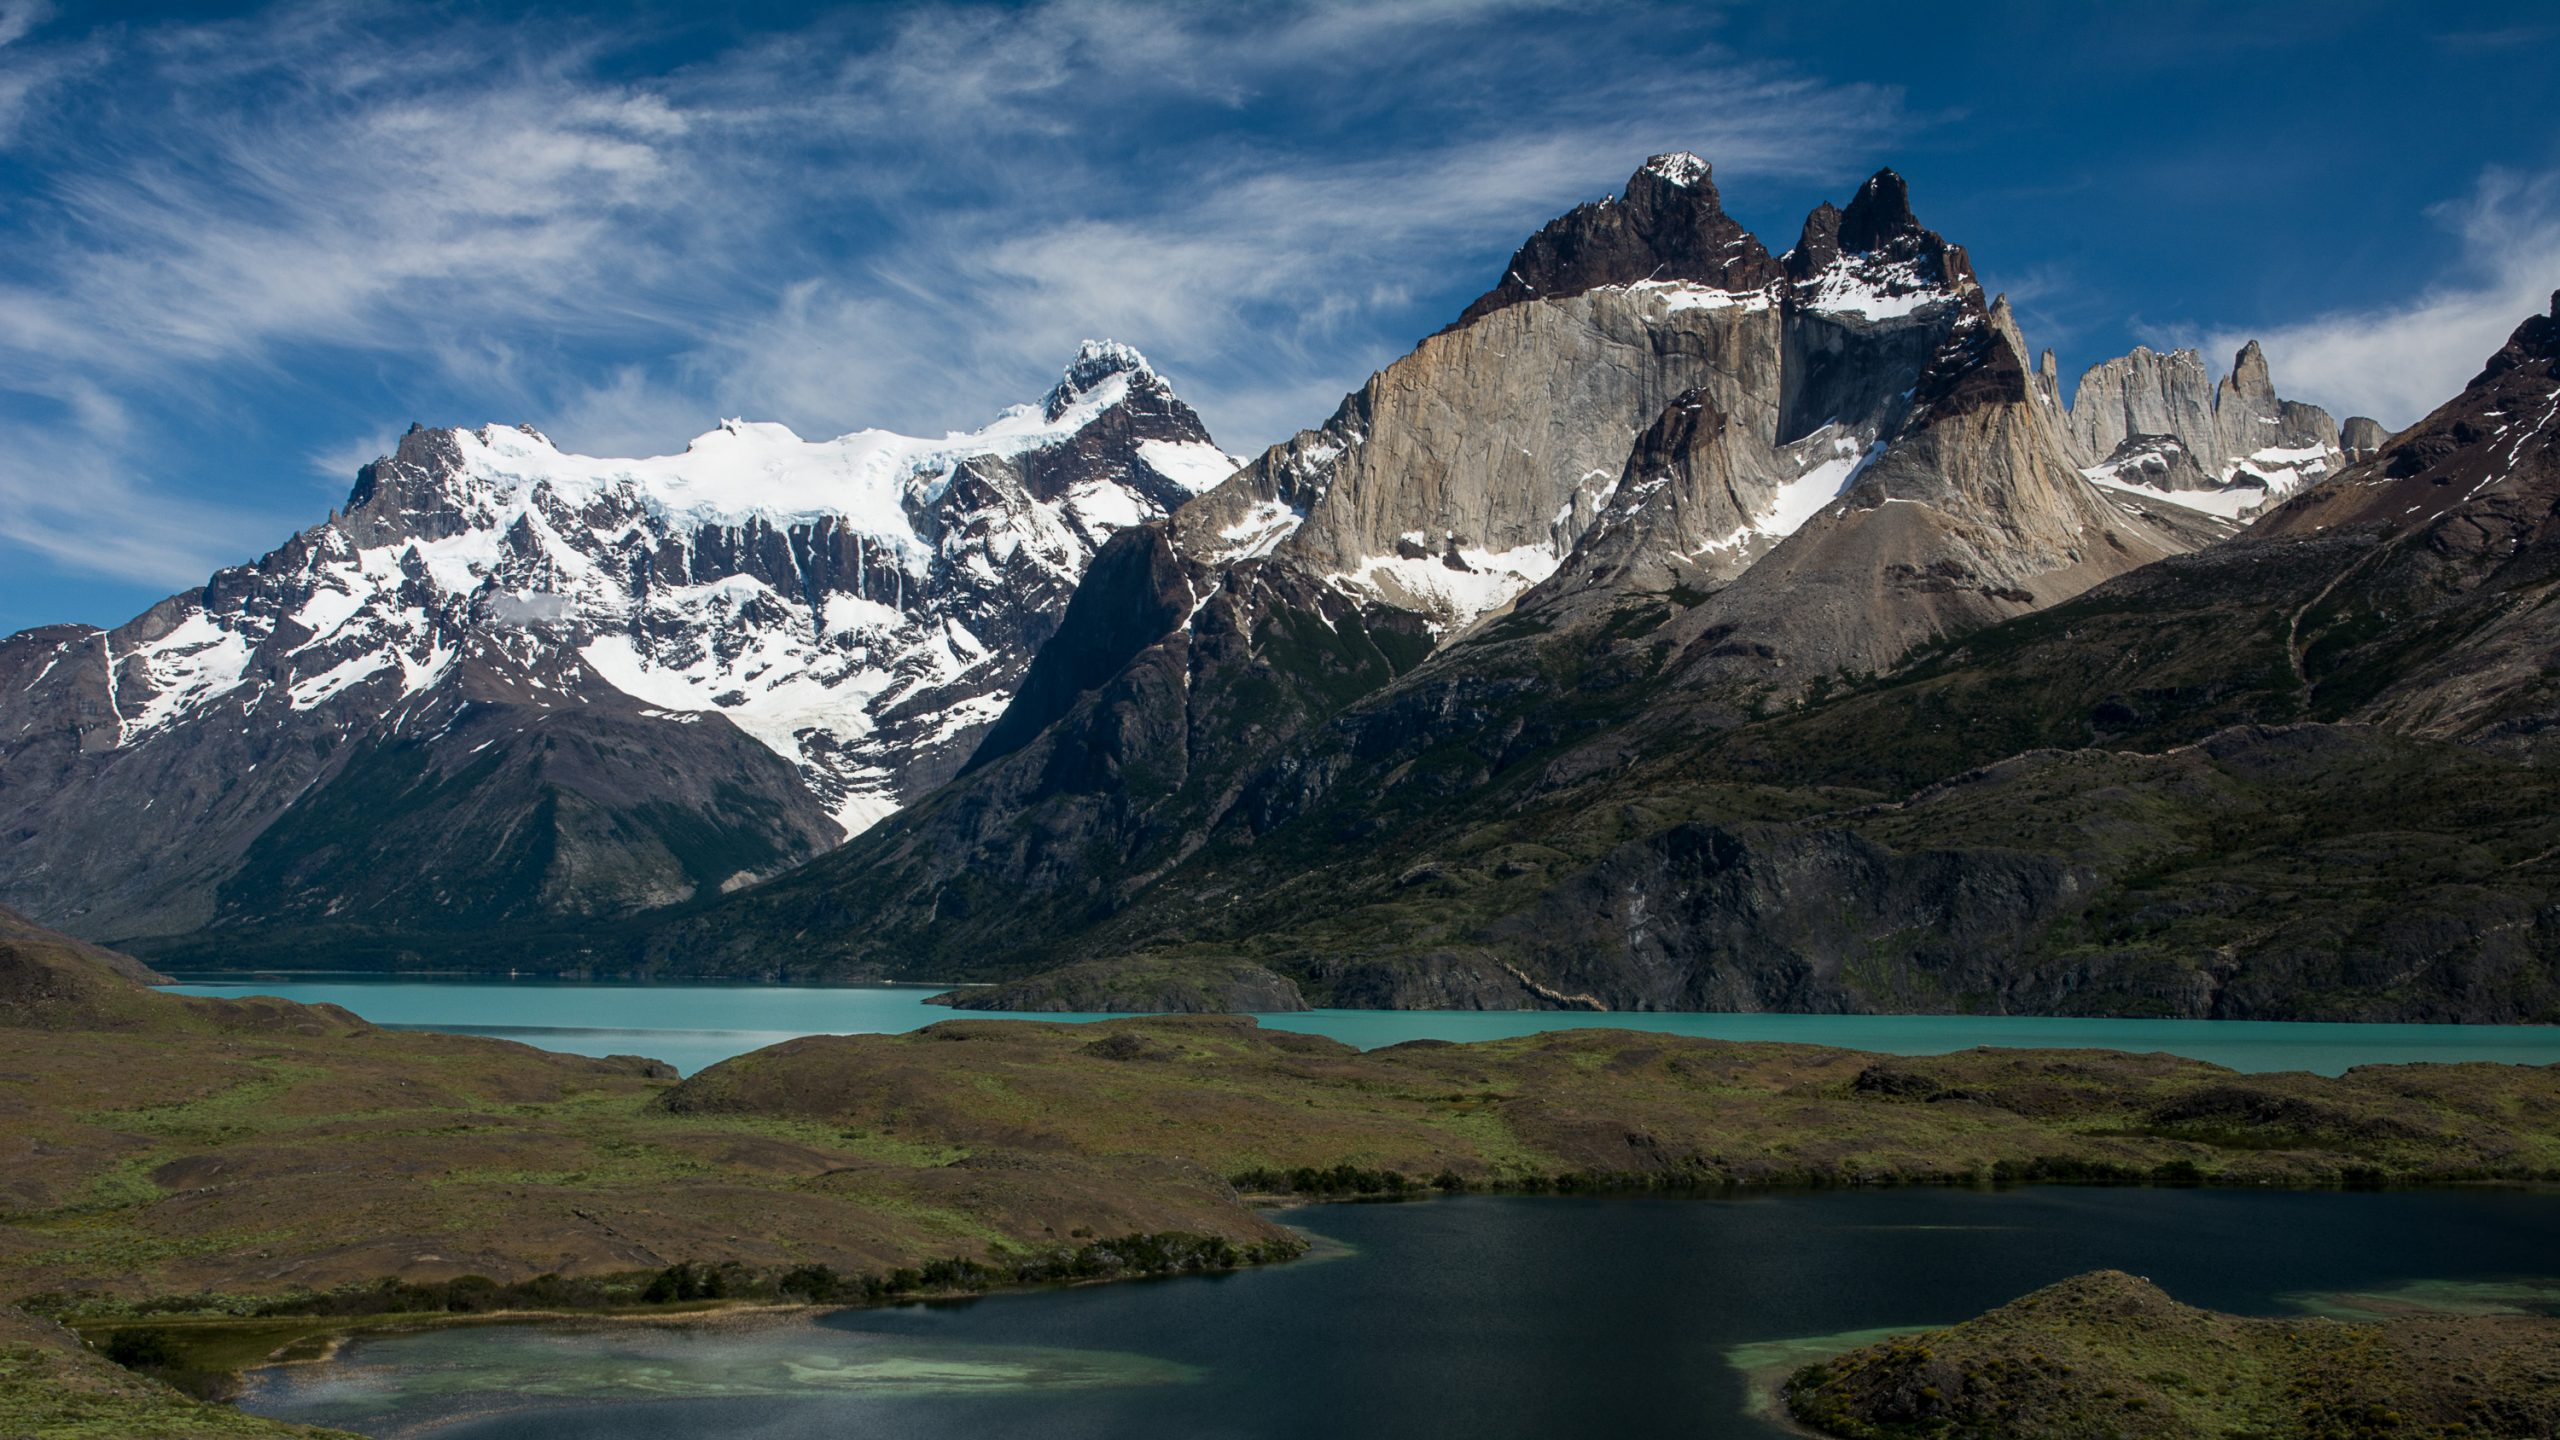 viaggio-in-patagona-torres-del-paine-laghi